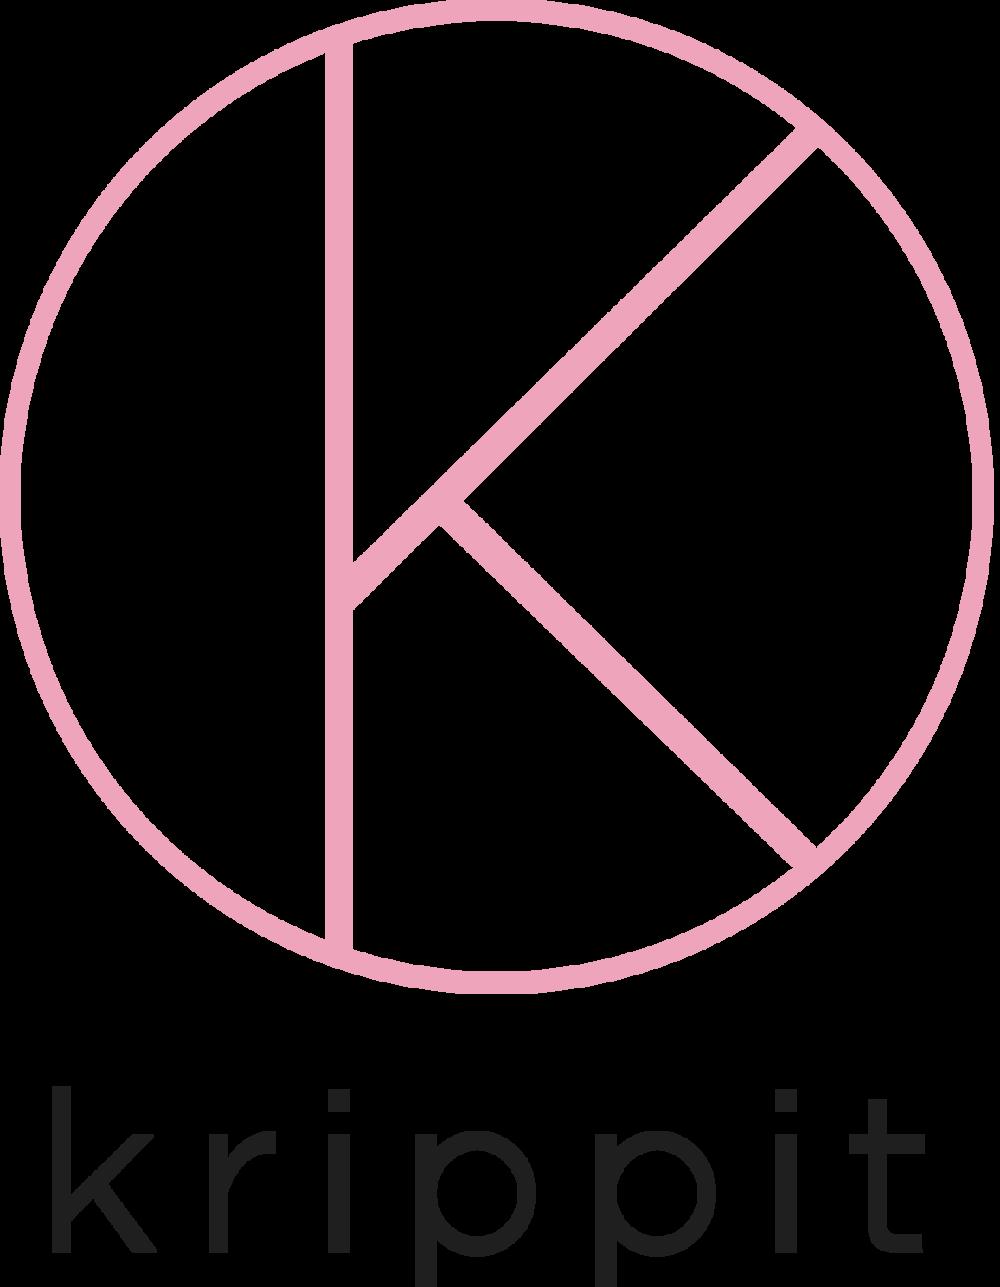 Krippit-Logo_TM (1) (2).png